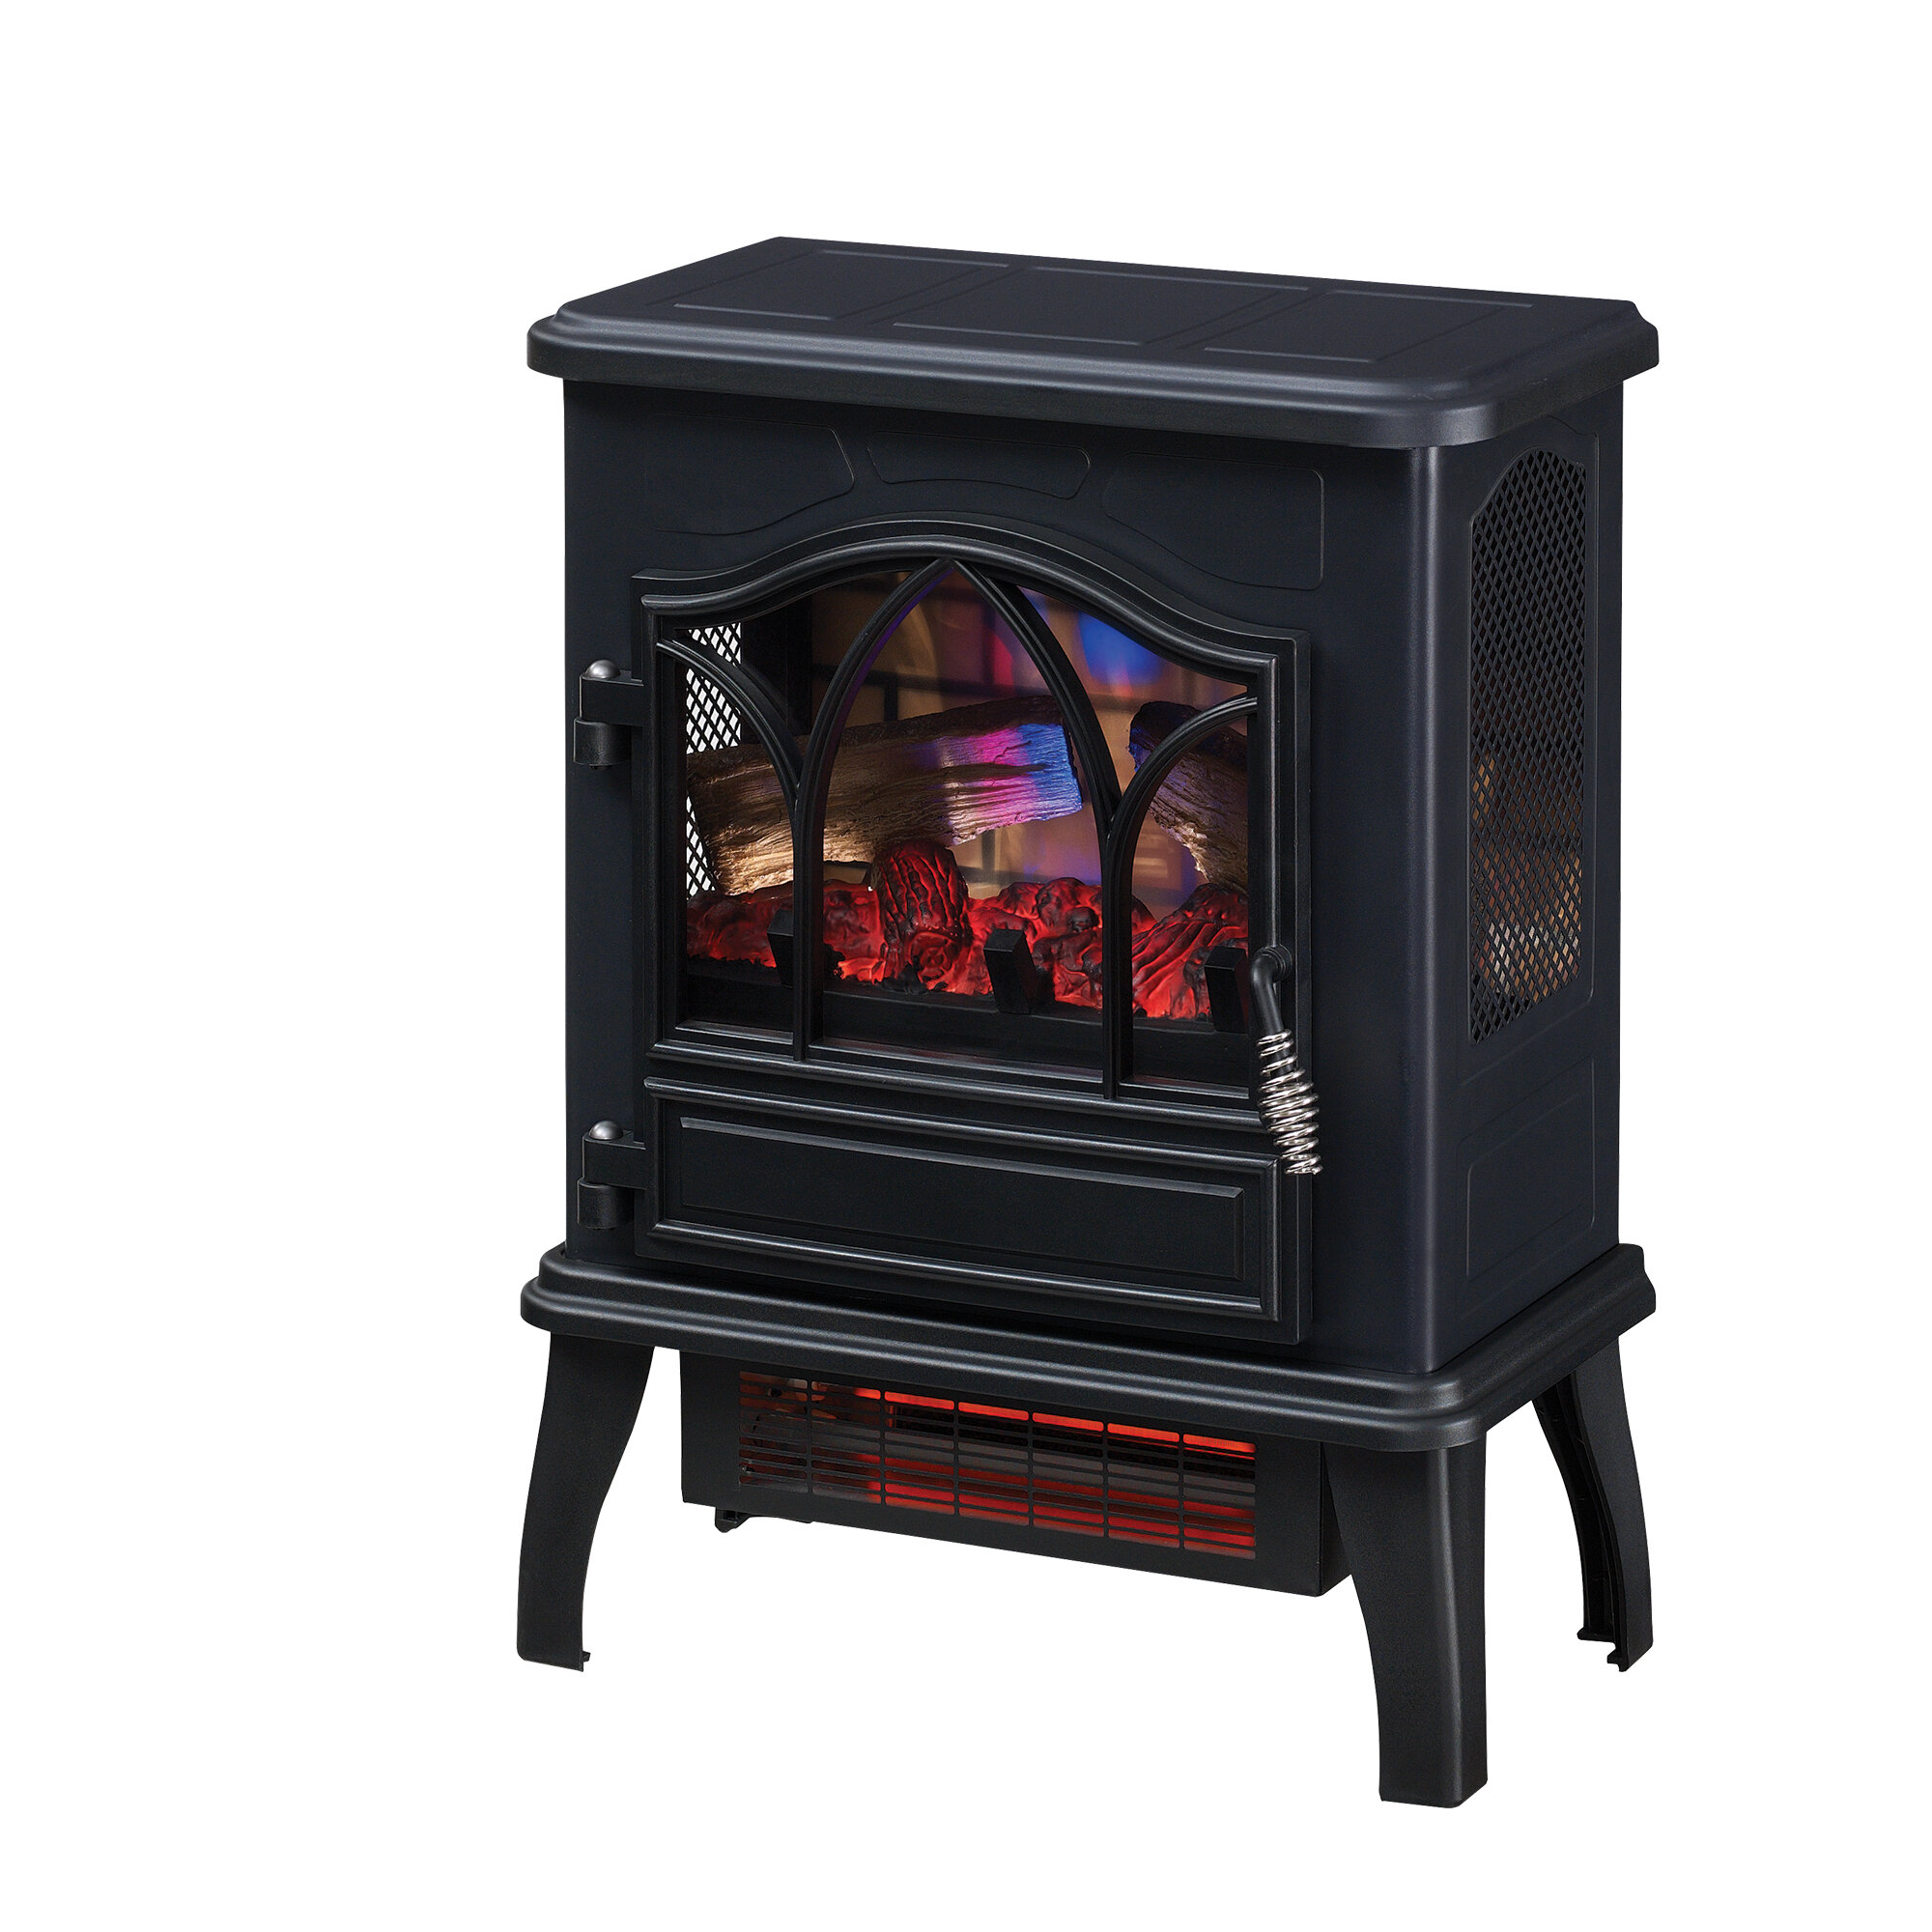 electric potbelly stoves wayfair rh wayfair com Rustic Electric Fireplace Stove Pot Belly Stove Heating